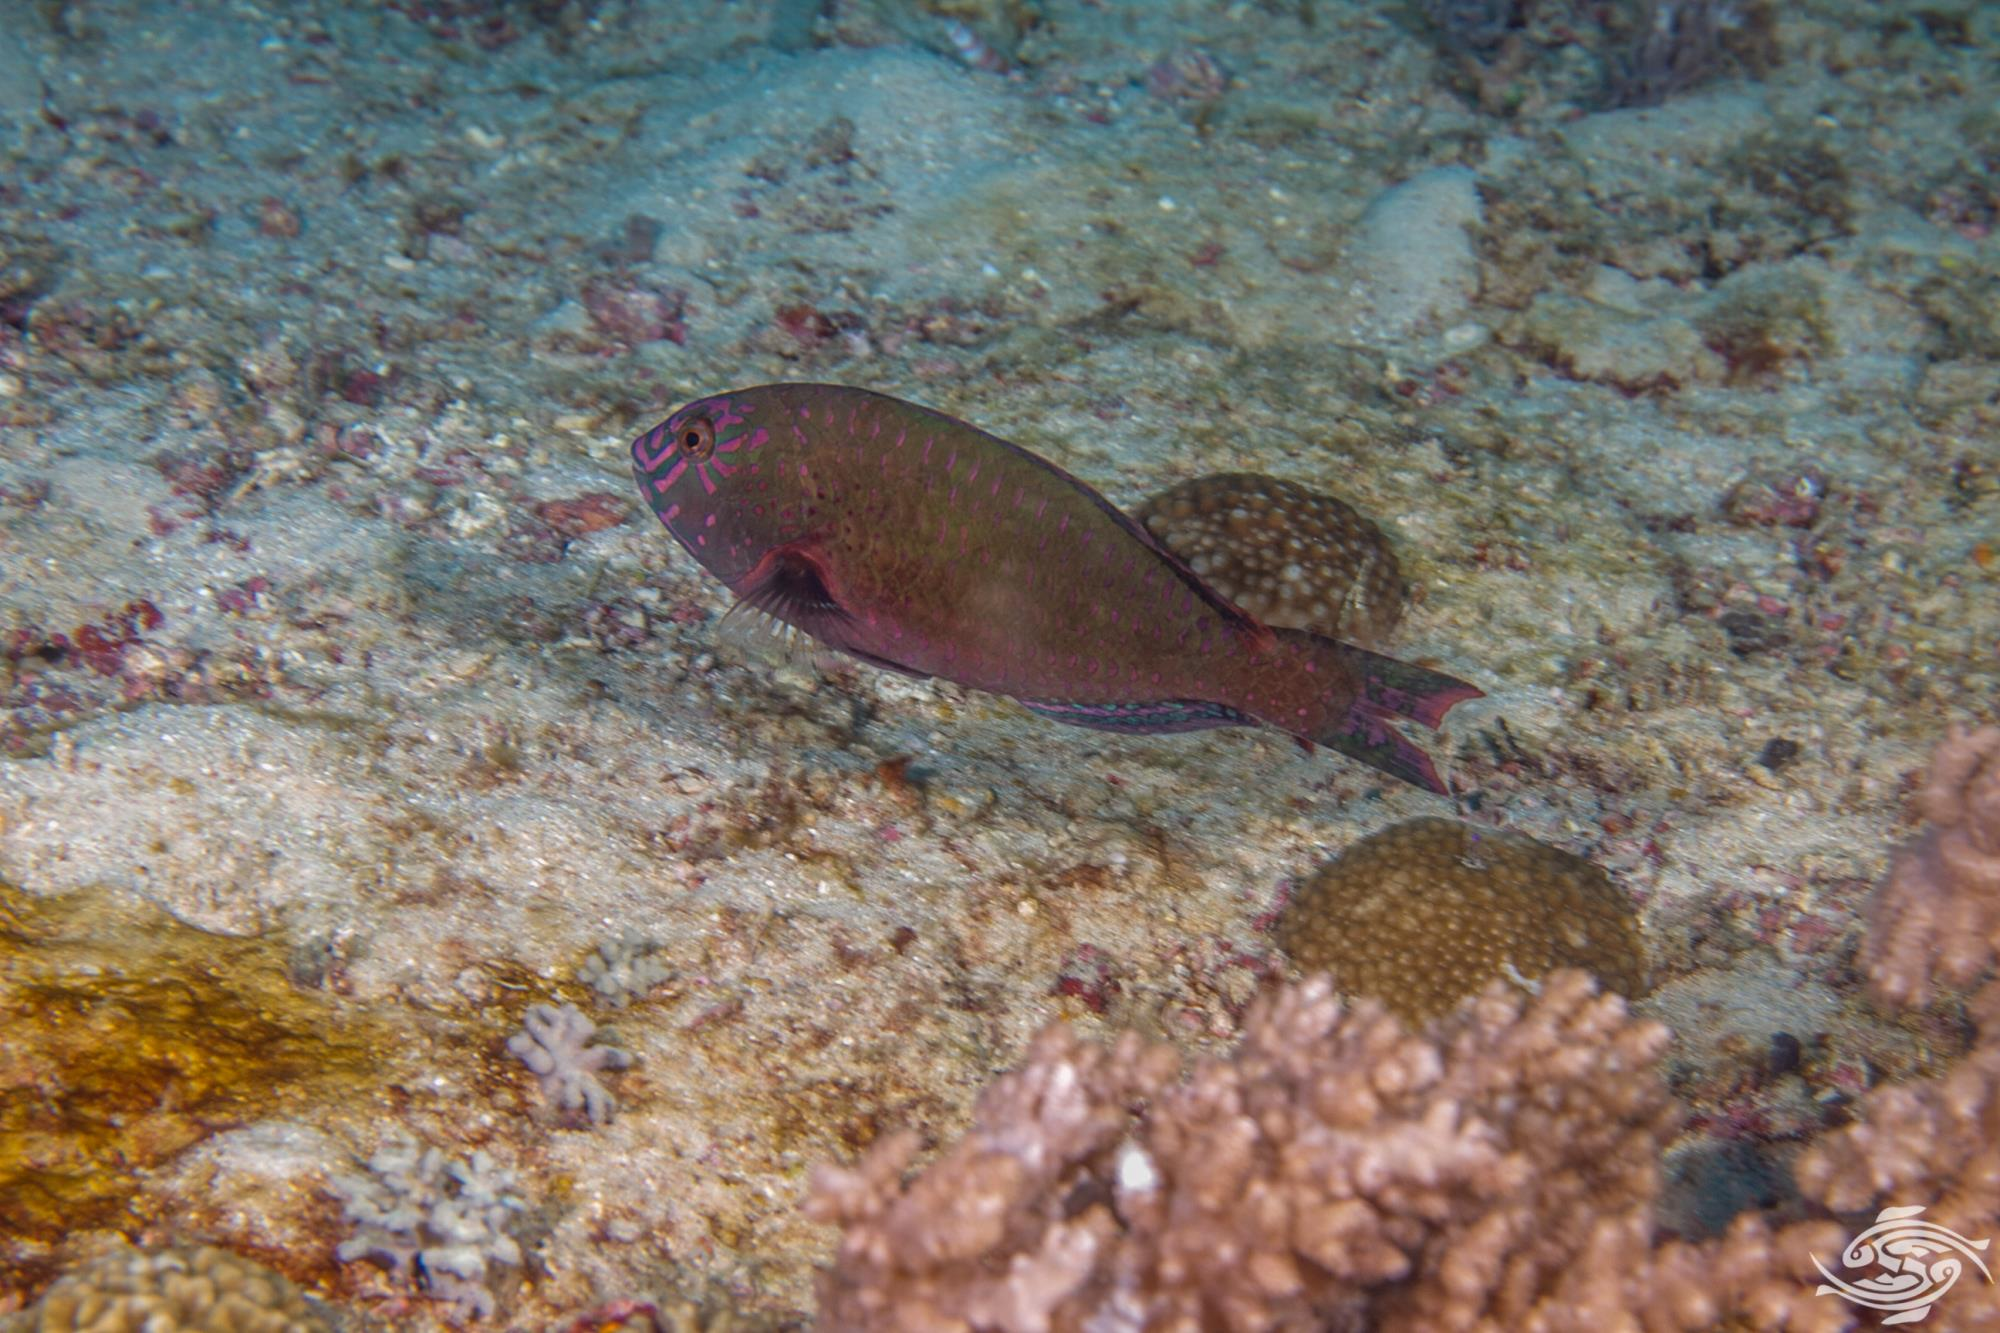 Stareye Parrotfish, Calotomus carolinus male